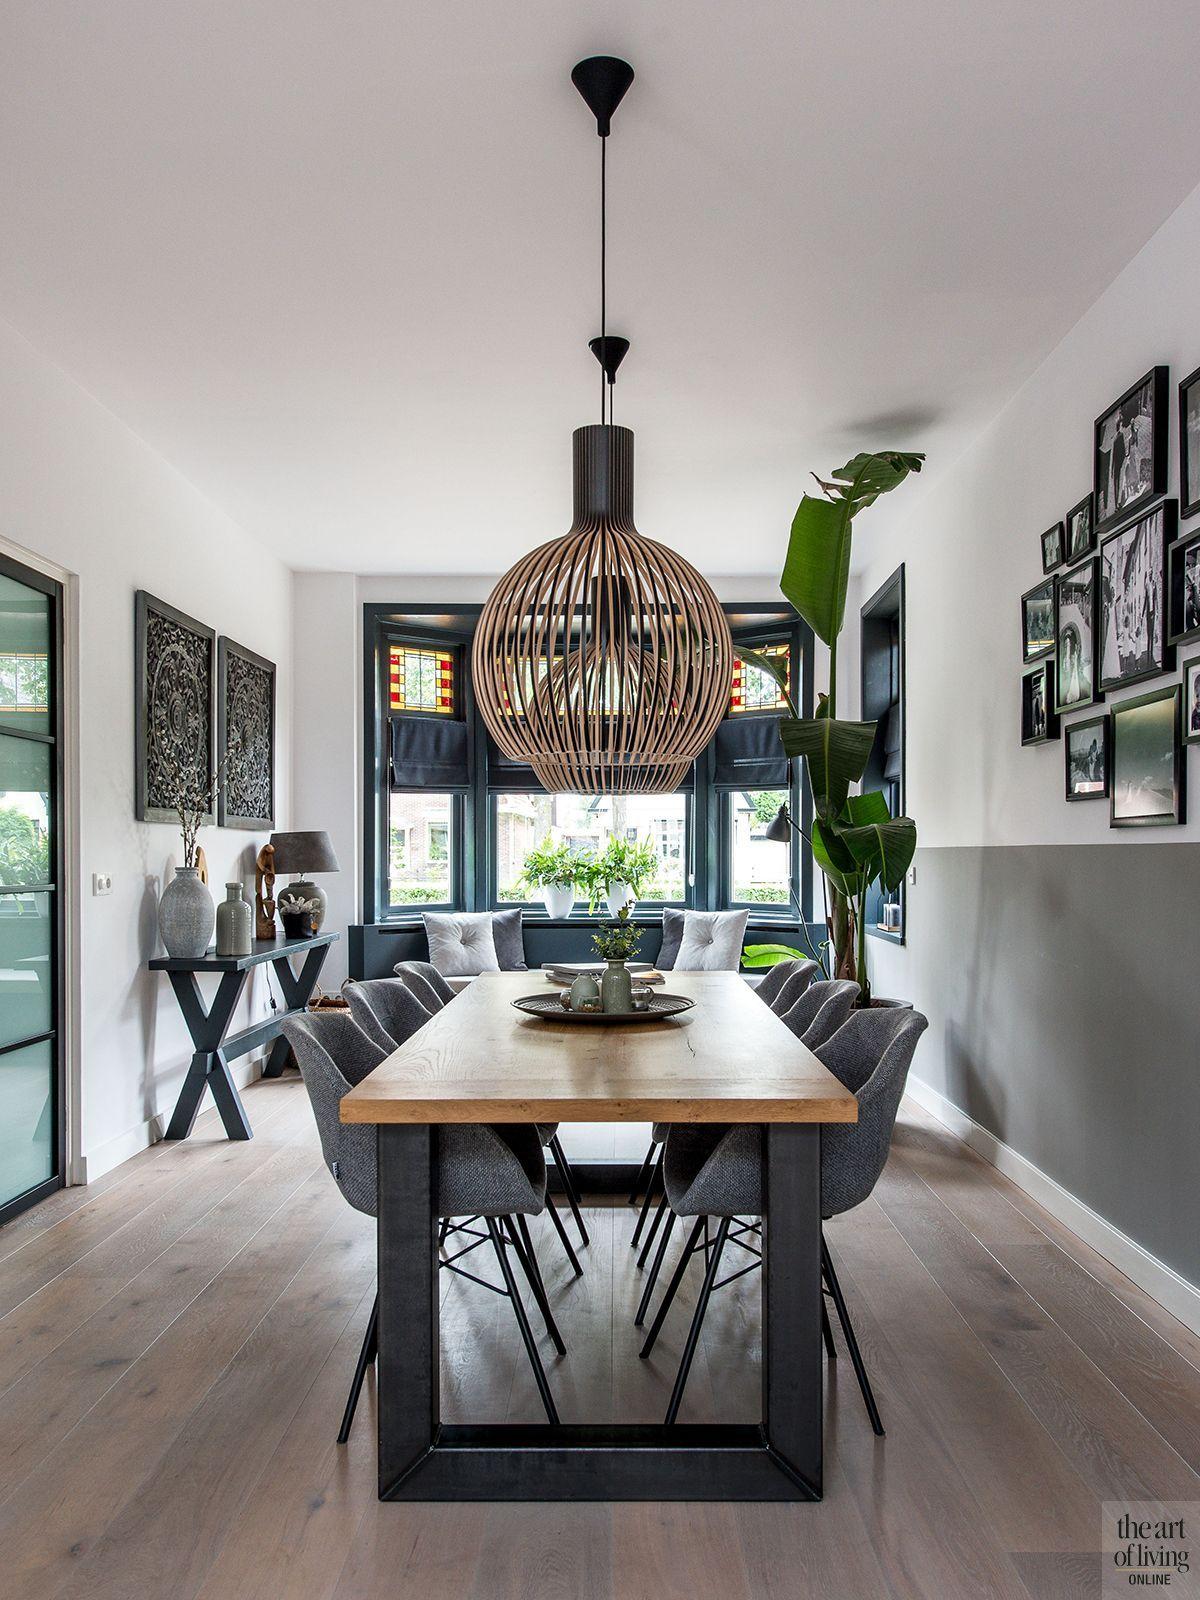 Modern interieur met erker   Lifs, ,  #erker #HuiskamerInrichting #interieur